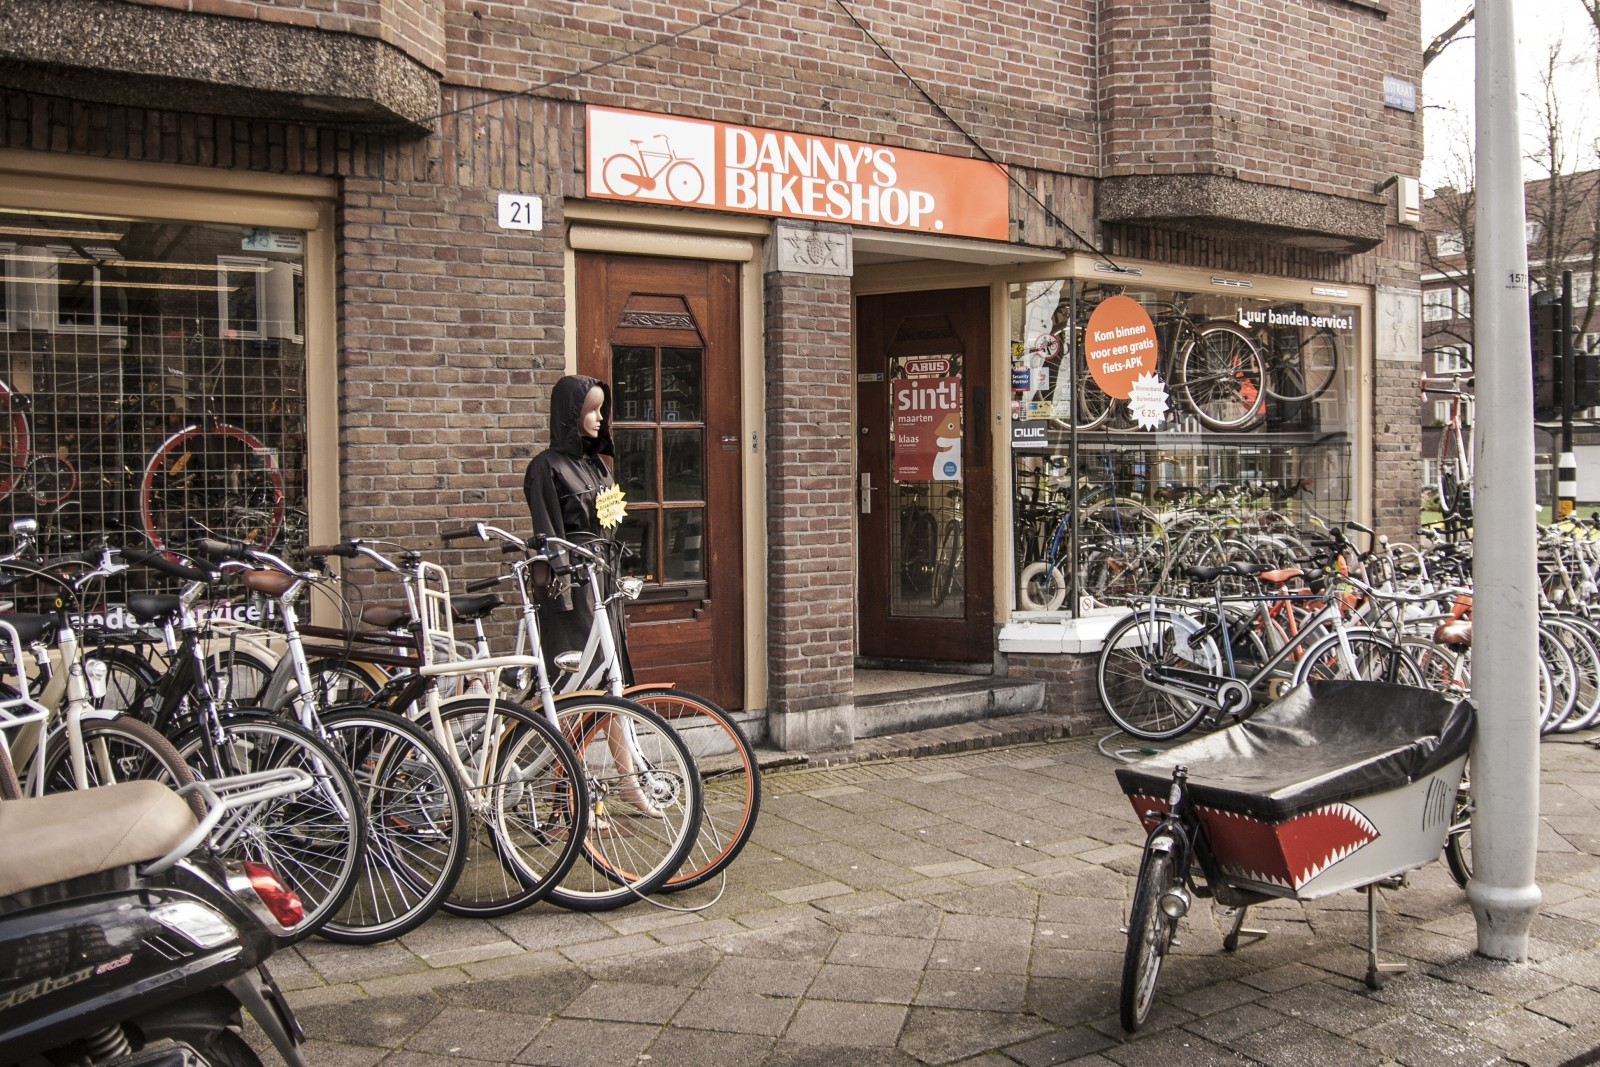 Danny's bikeshop